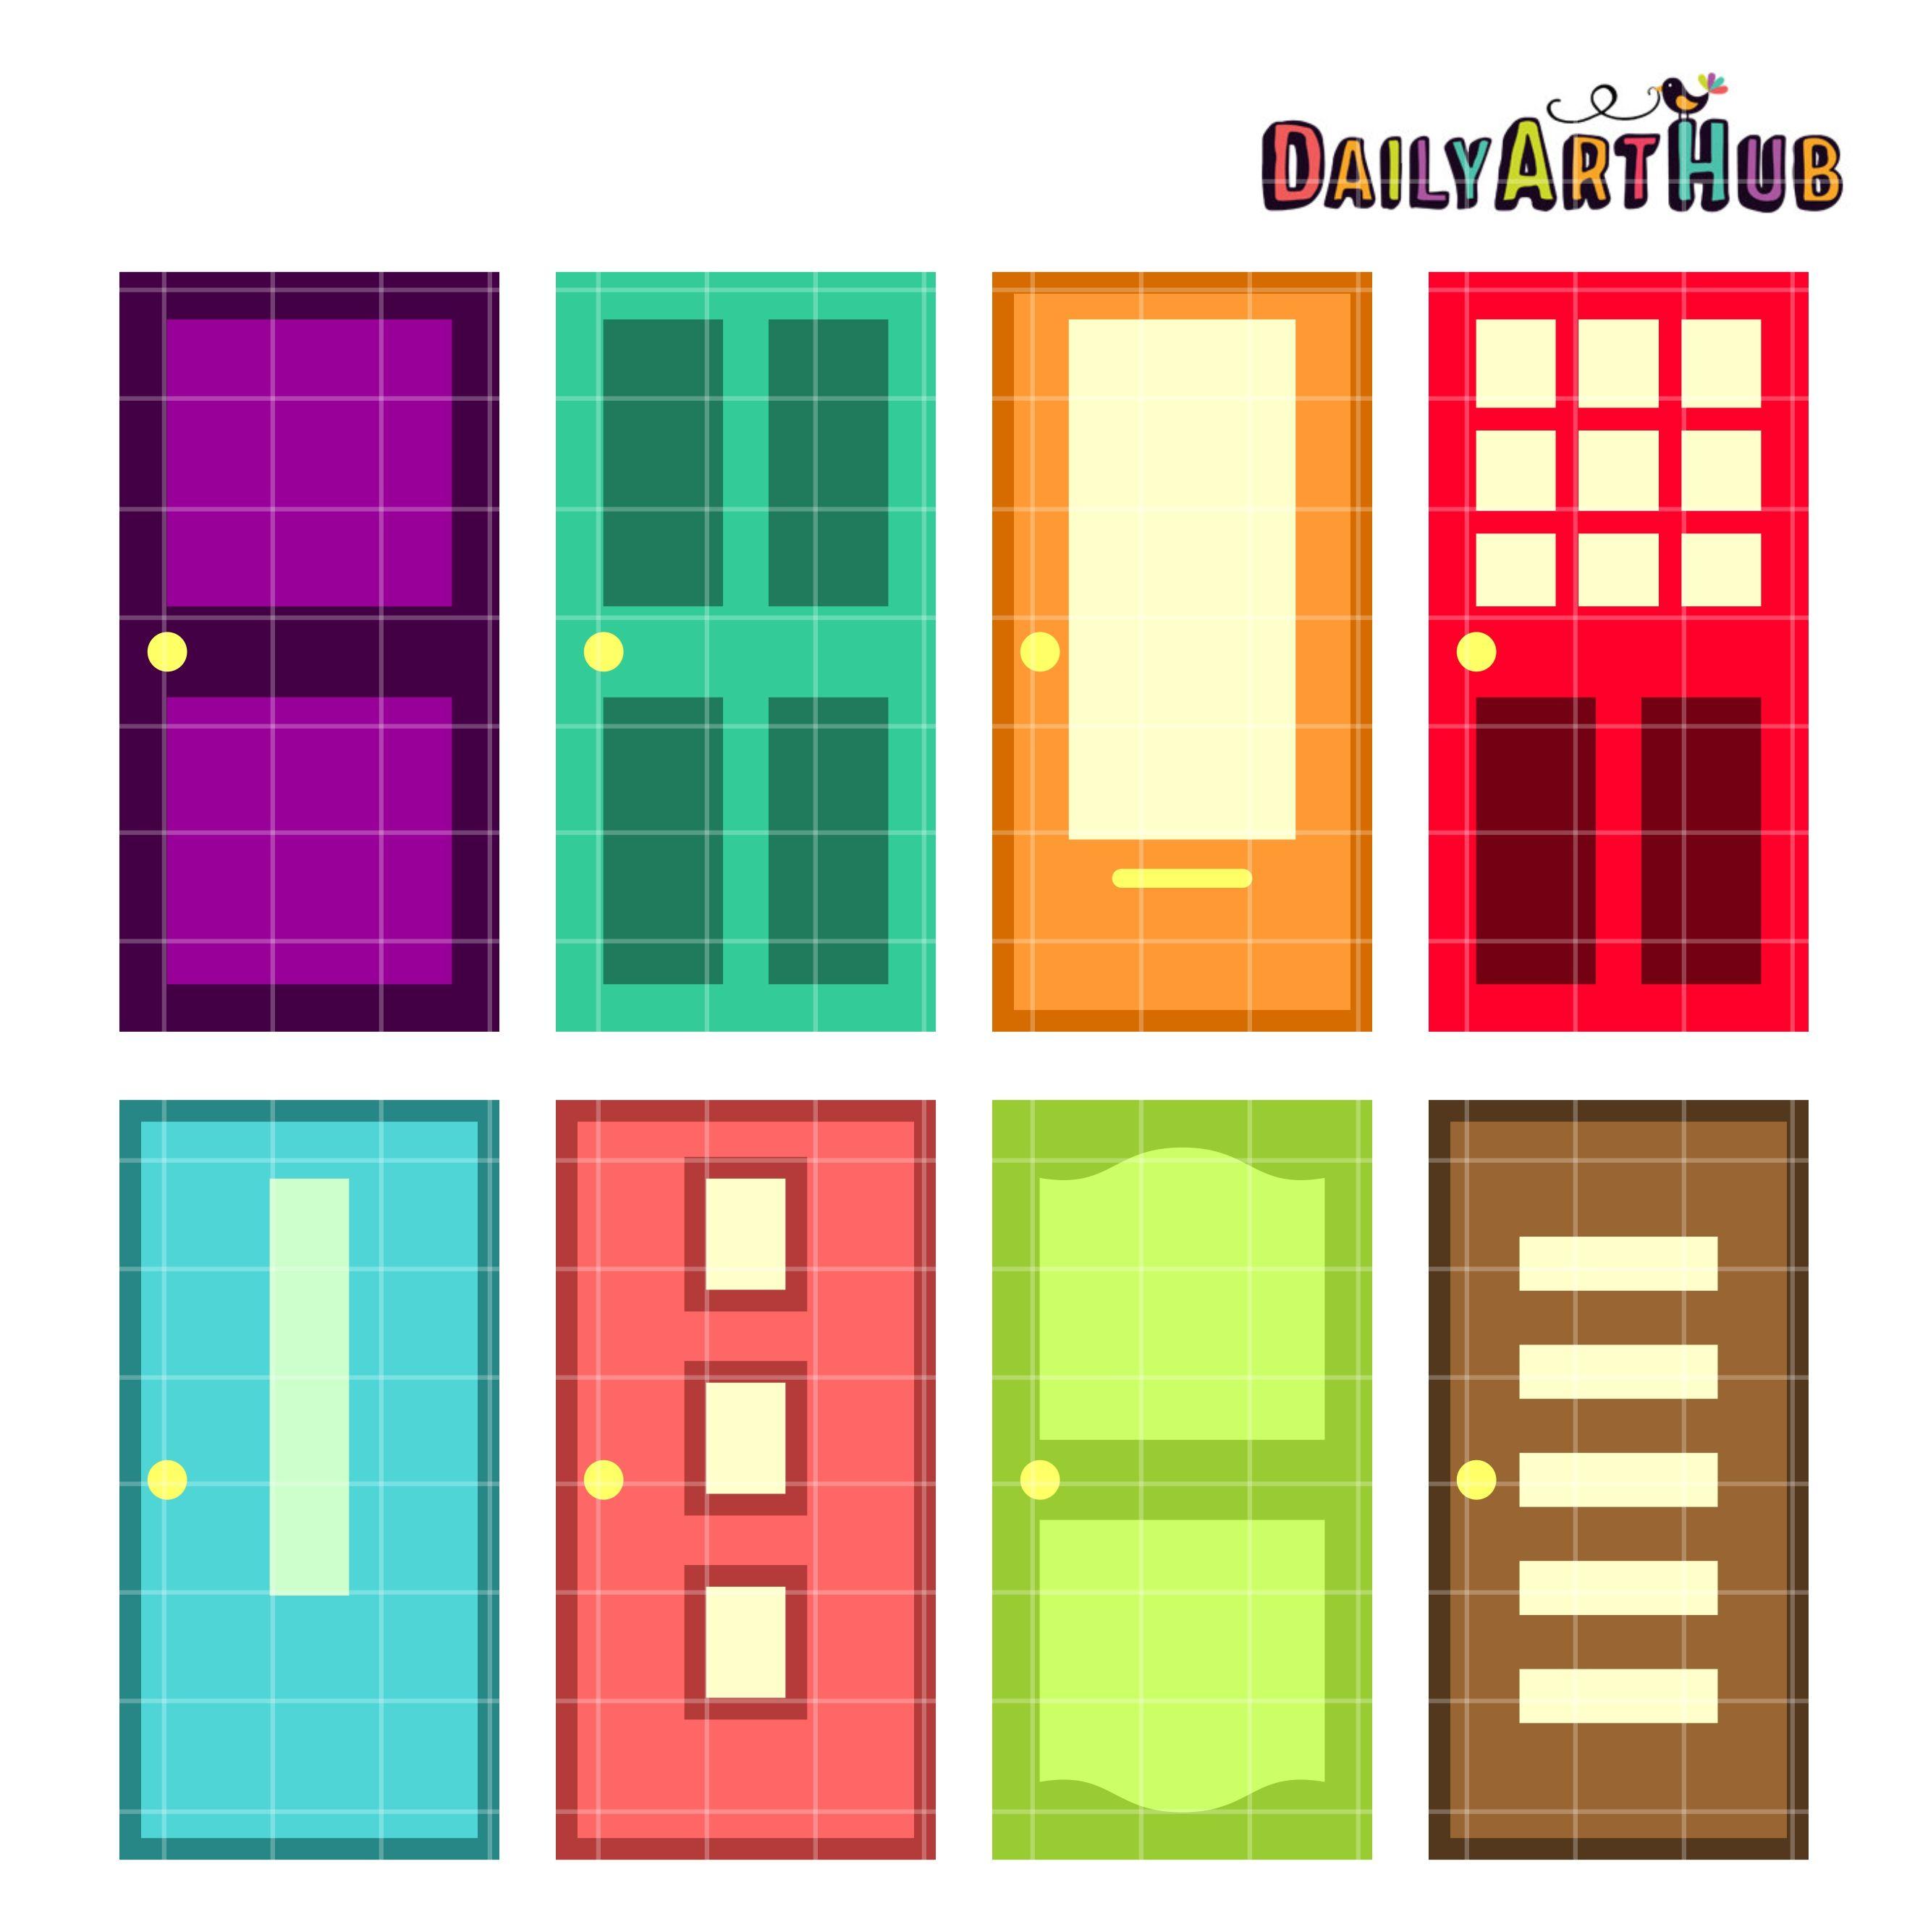 Colorful Doors Clip Art Set Daily Art Hub Free Clip Art Everyday Monsters Inc Doors Monster Decorations Monster Inc Birthday